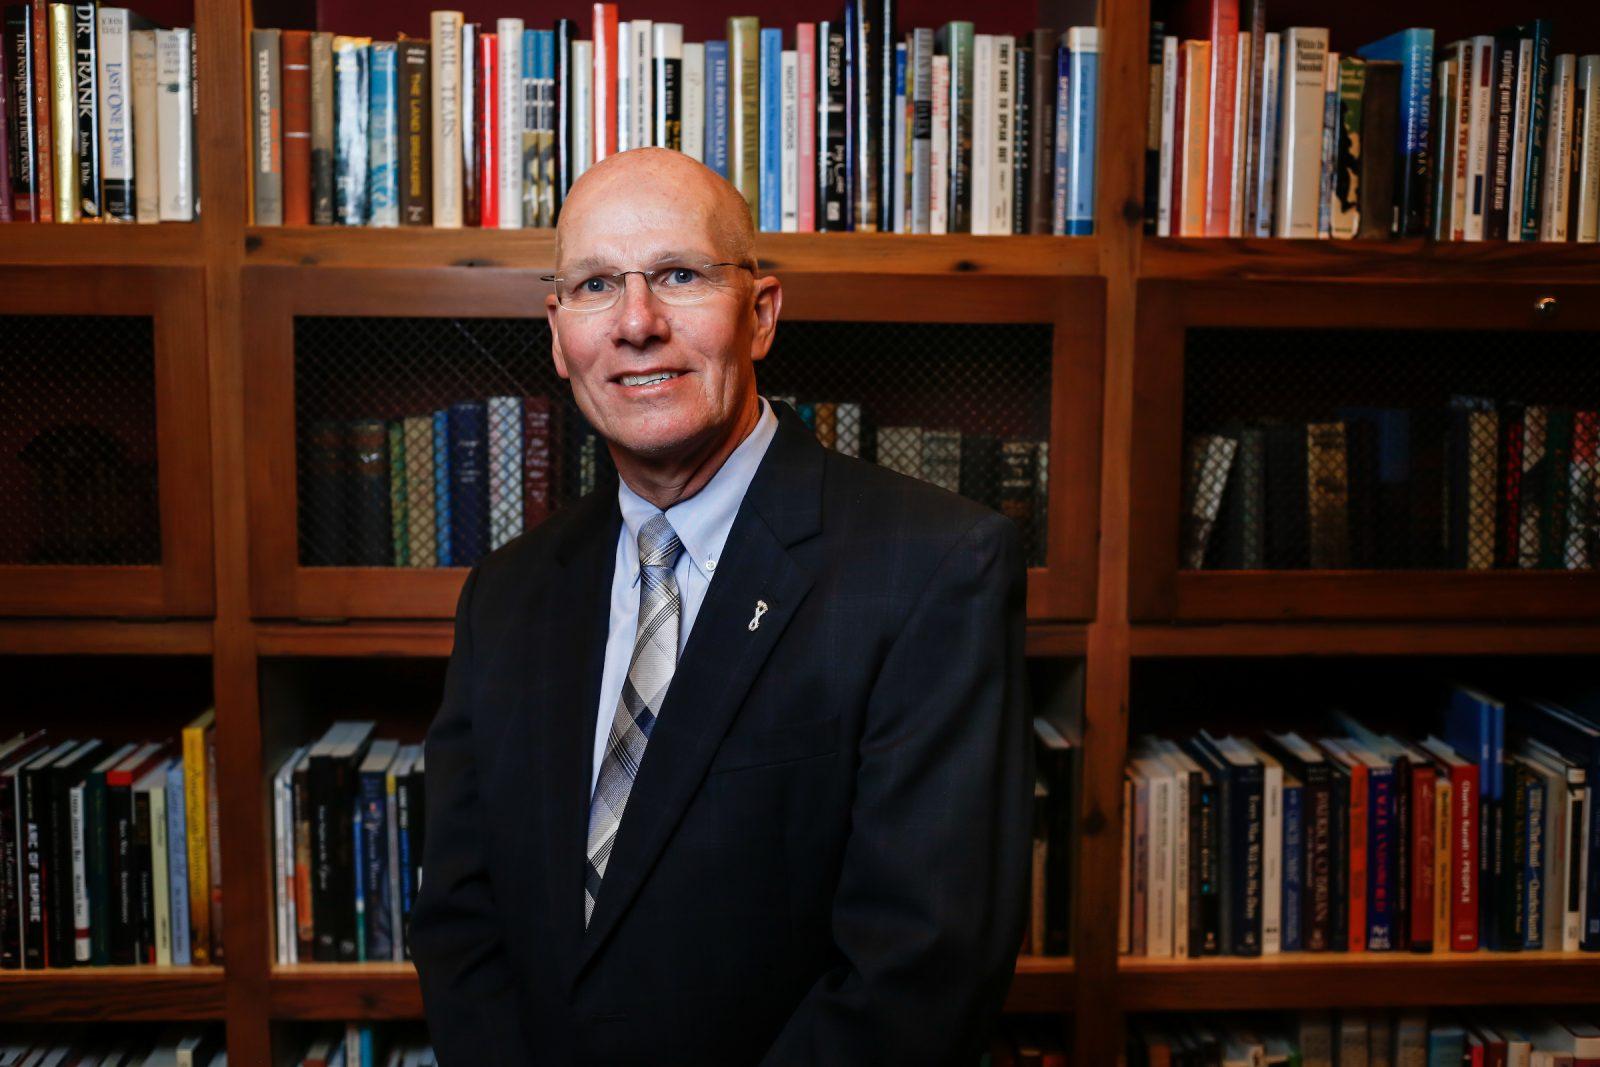 Pharmacy Dean Bob Blouin received the GAA's Faculty Service Award in January 2016. (Photo by Ray Black III)